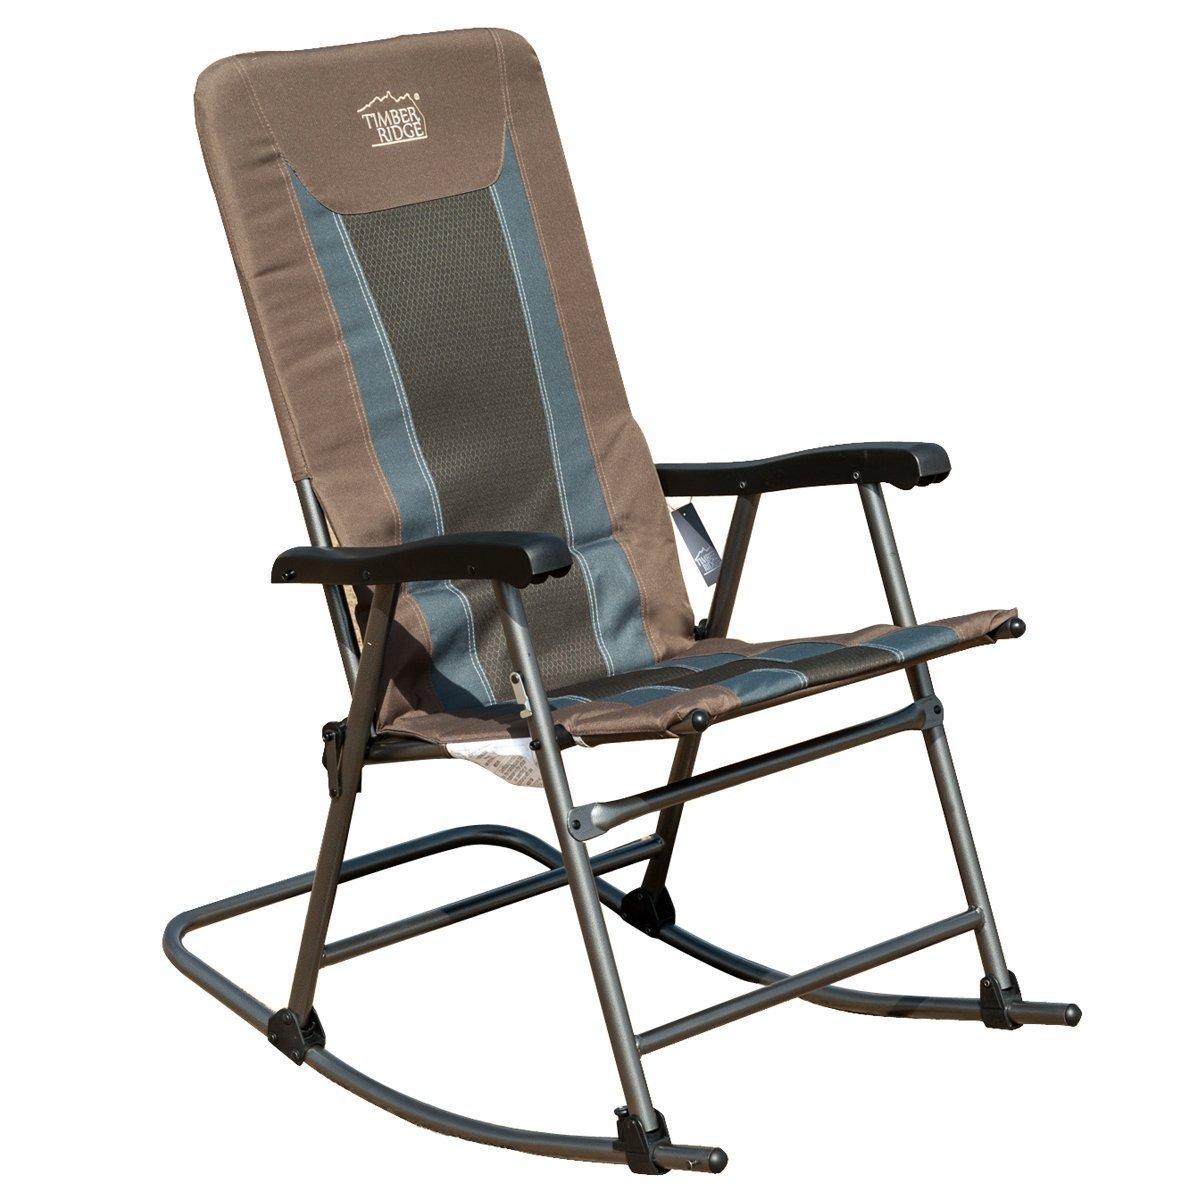 timber ridge smooth glide lightweight padded folding rocking chair 300lbs